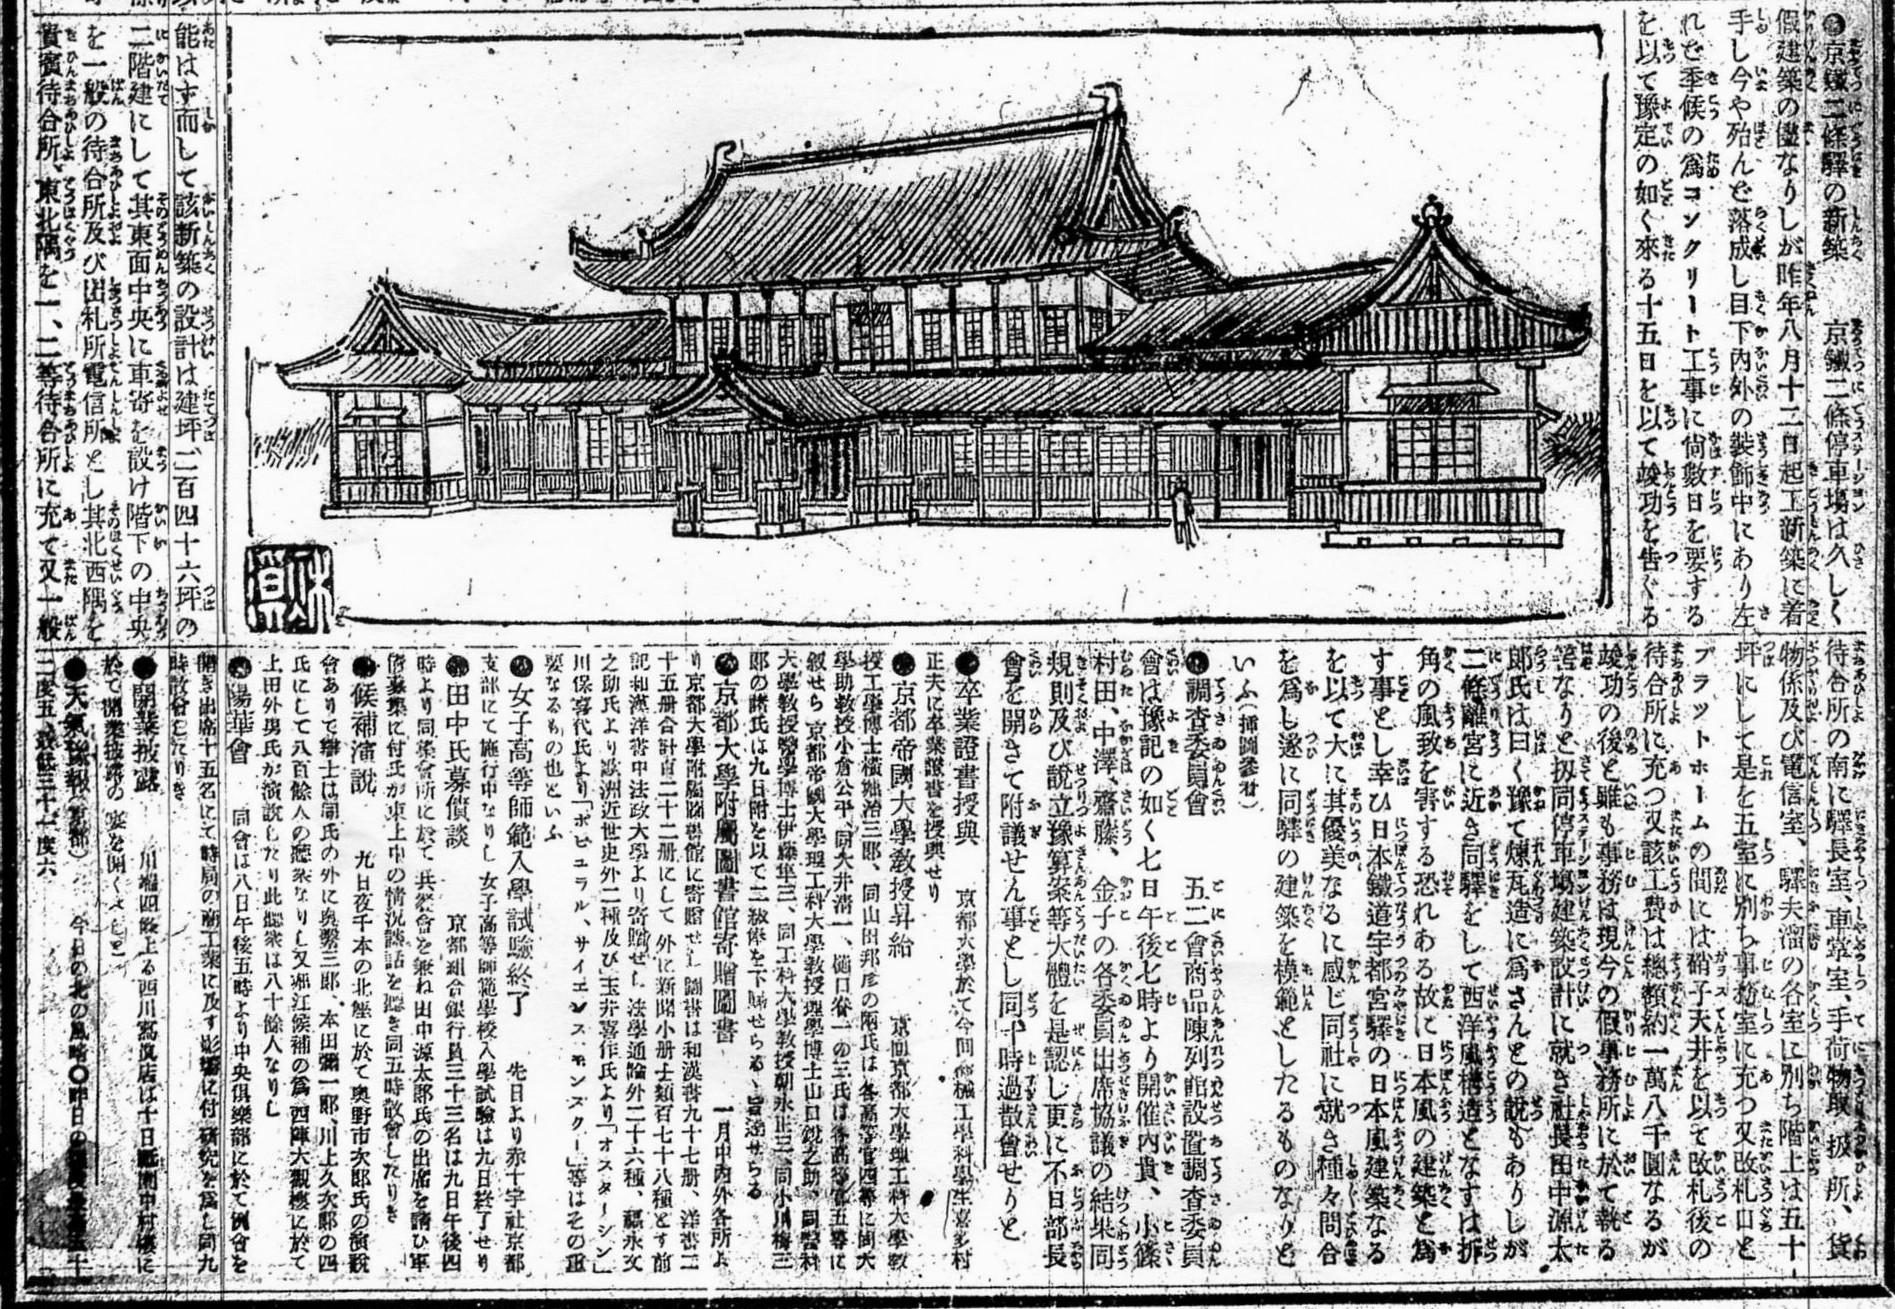 https://upload.wikimedia.org/wikipedia/commons/4/43/Nijo_station1904osaka_asahi_shinbun.jpg